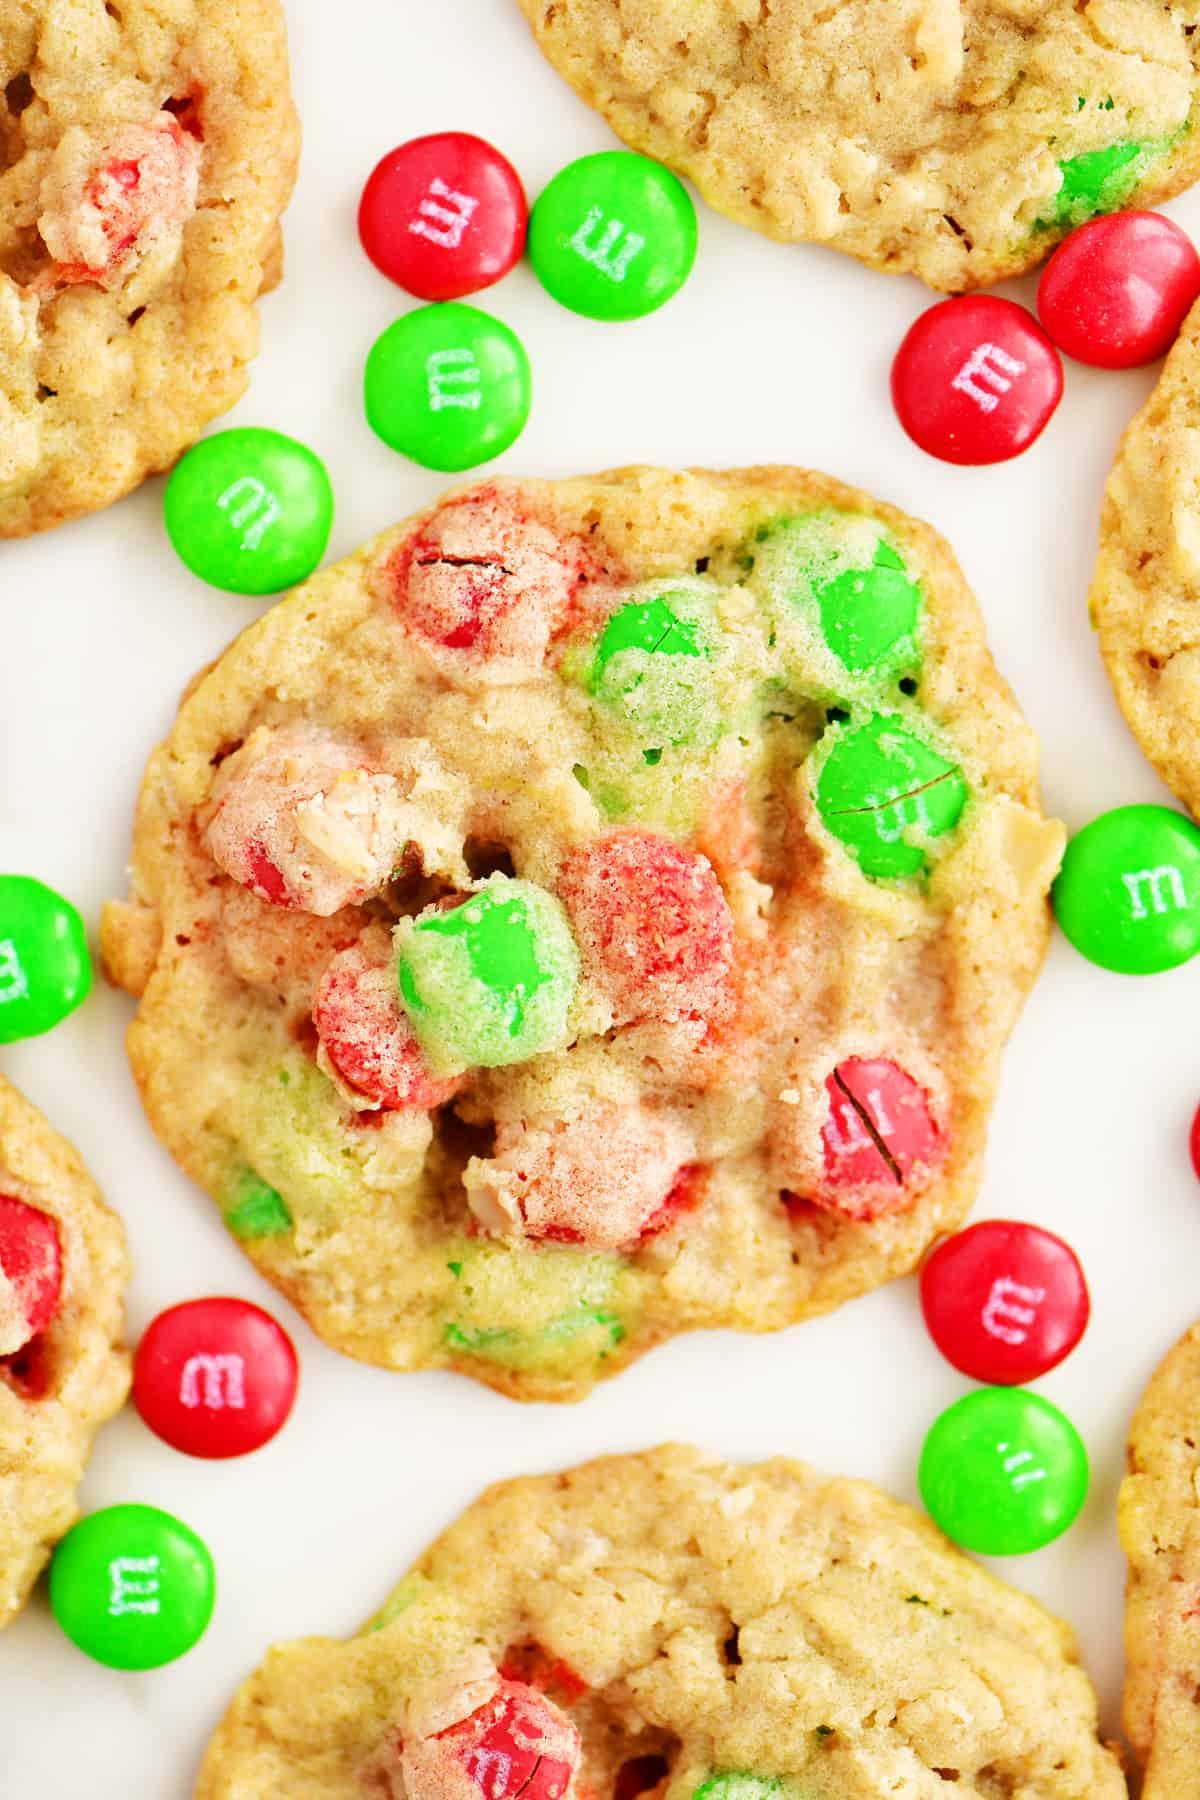 Christmas Oatmeal Cookies  Christmas Oatmeal M & M Cookies The Gunny Sack